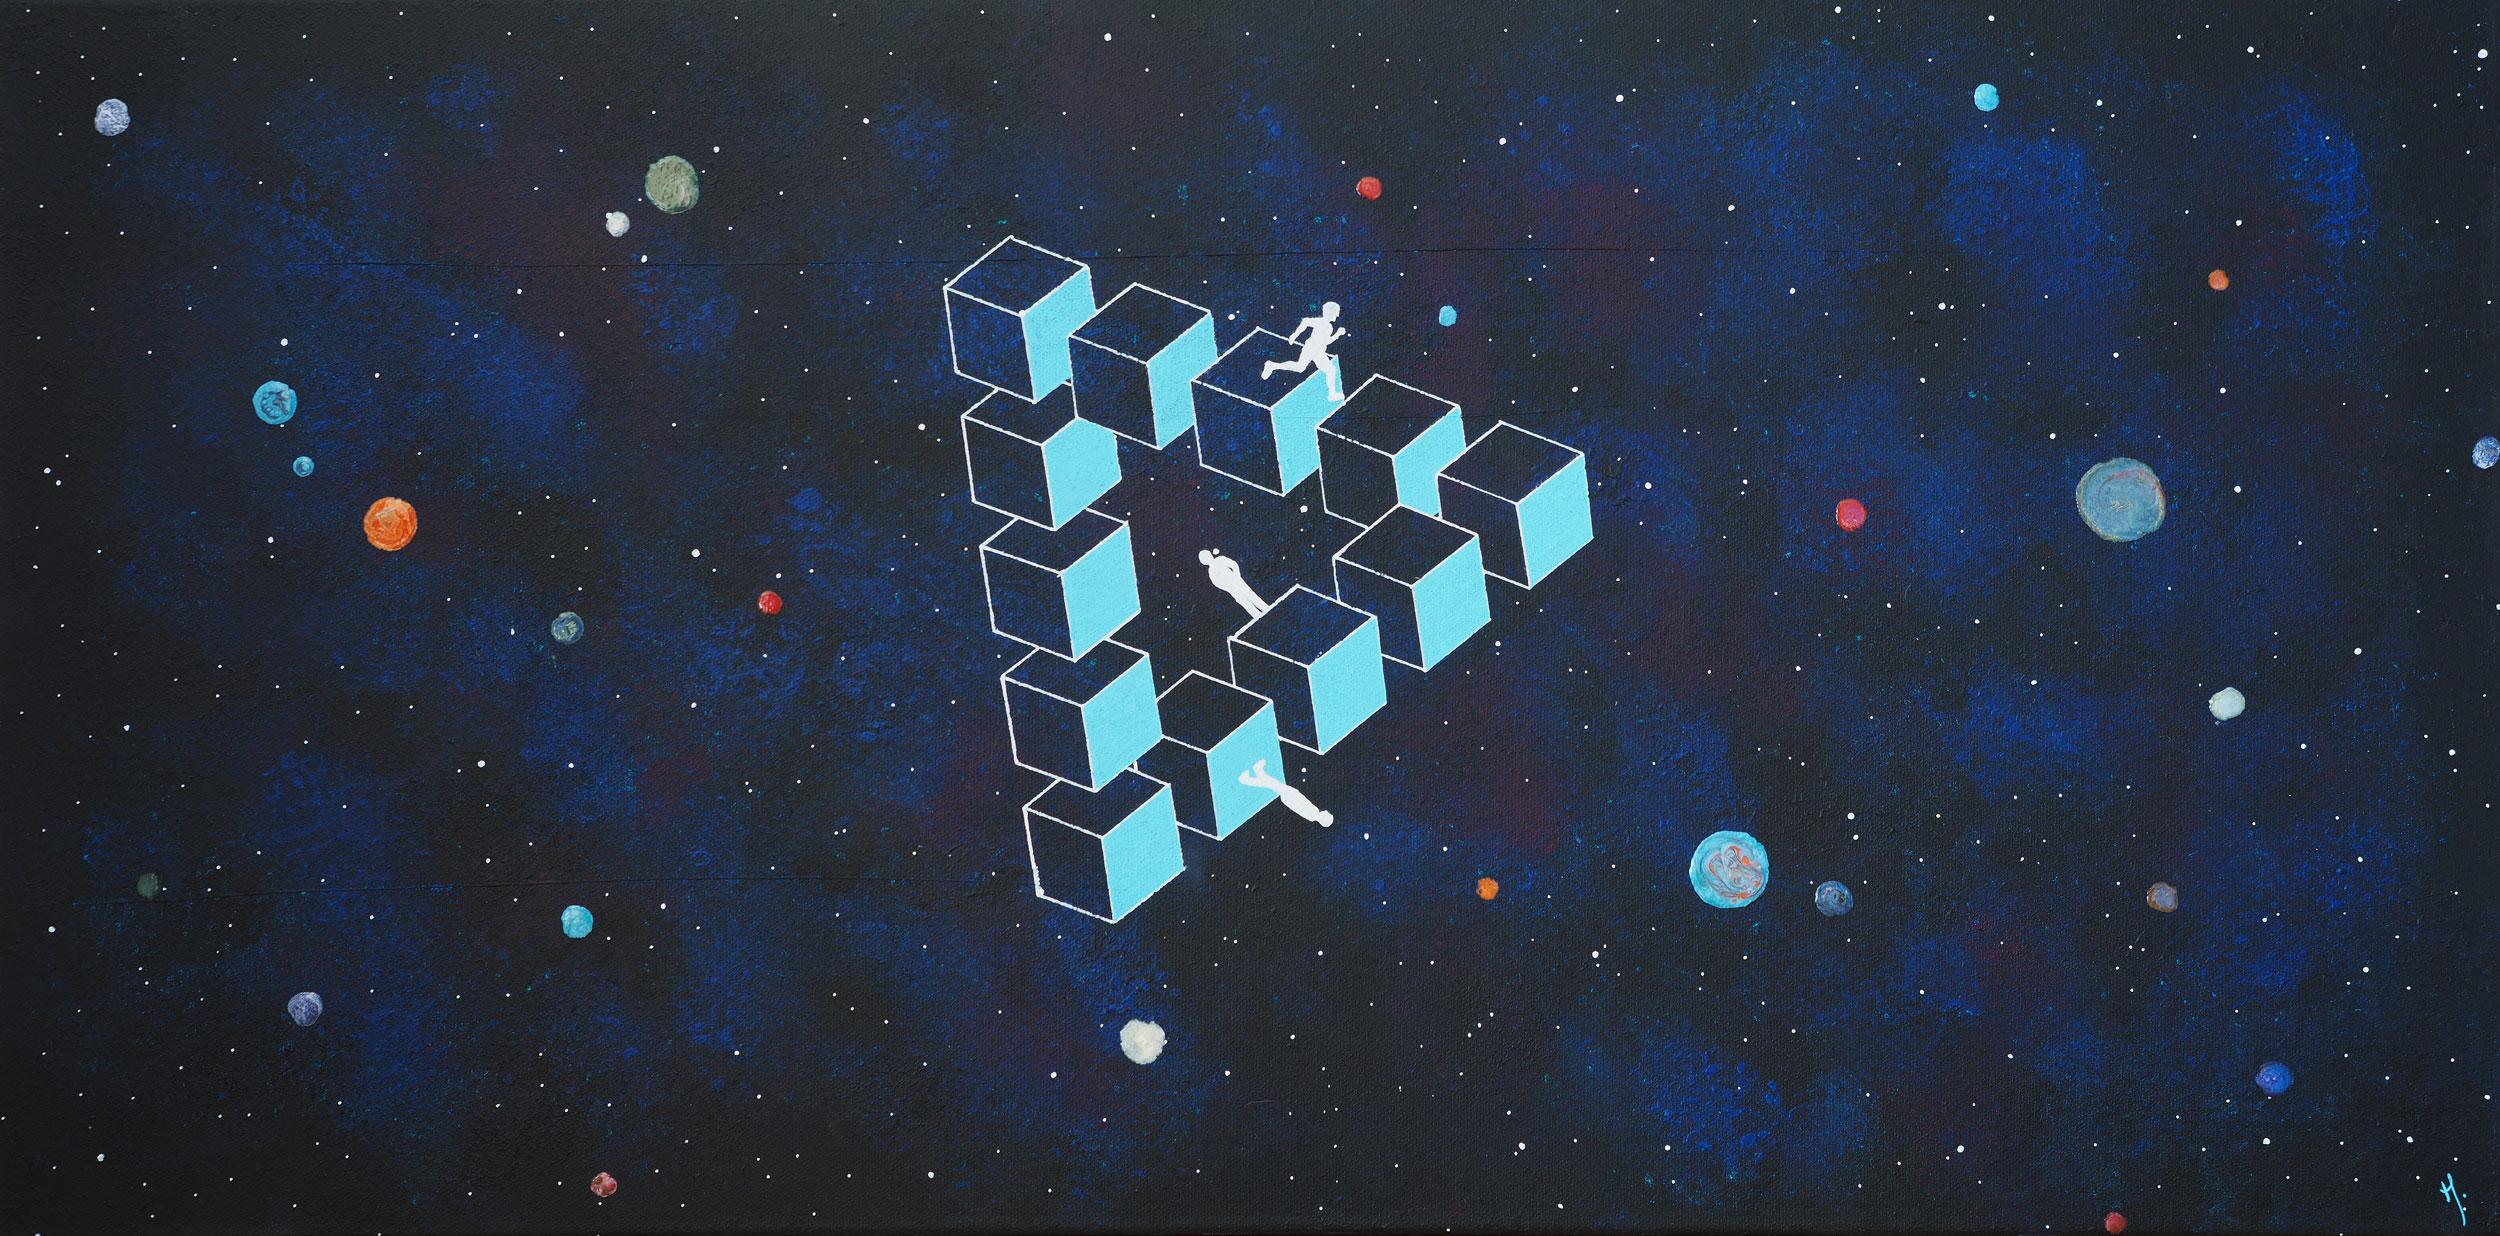 Penrose's gravity